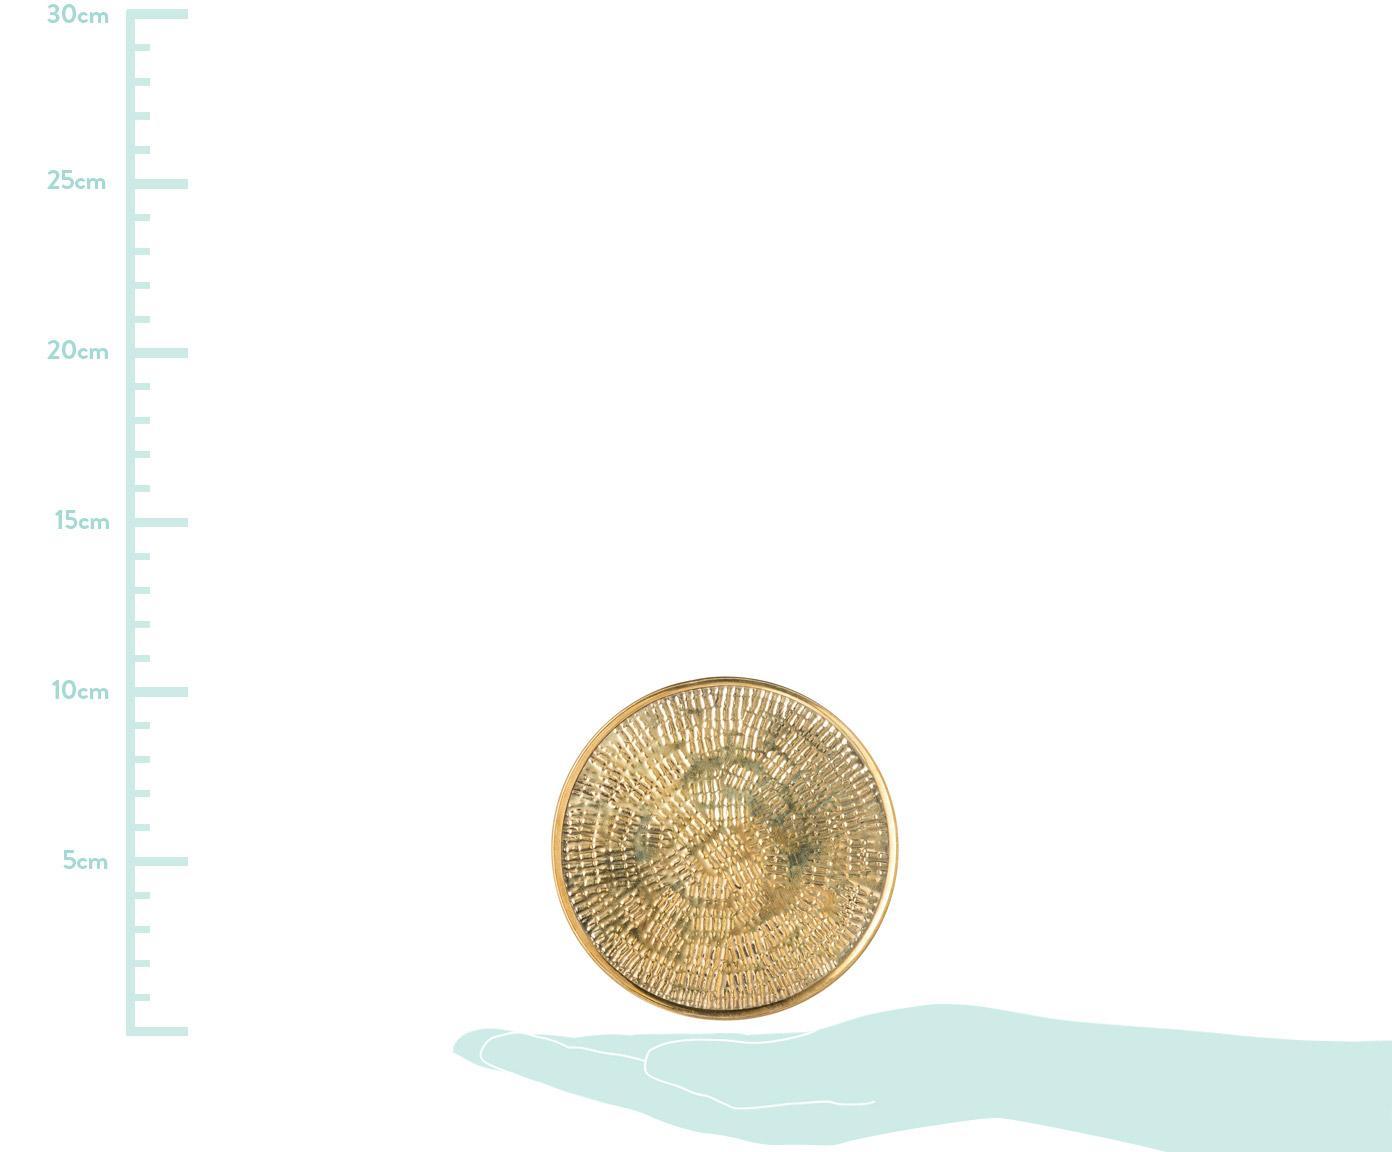 Untersetzer-Set Graphic, 4-tlg., Messing, gehämmert, Messing, Ø 10 cm